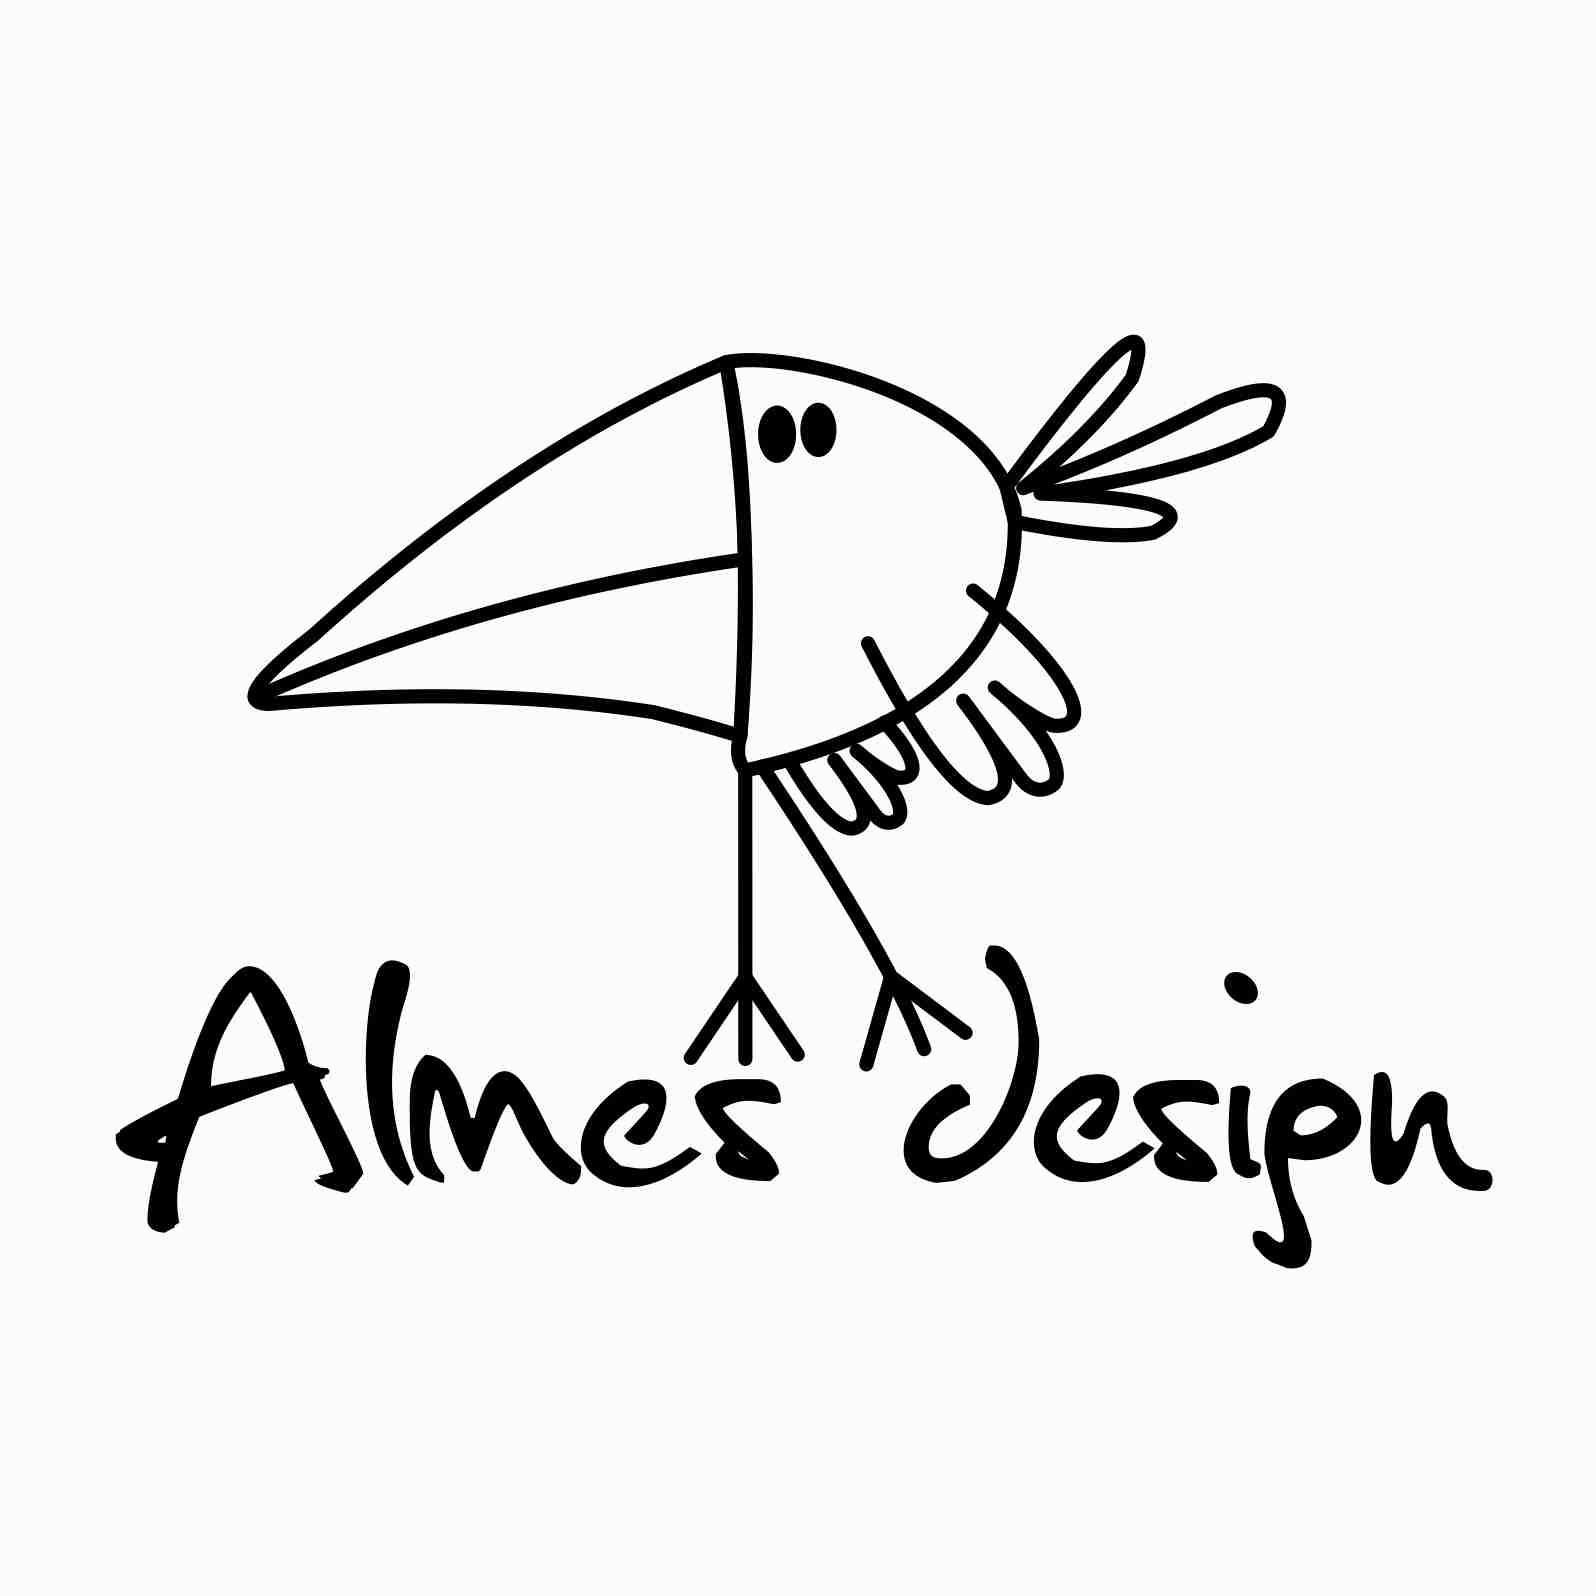 Almesdesign